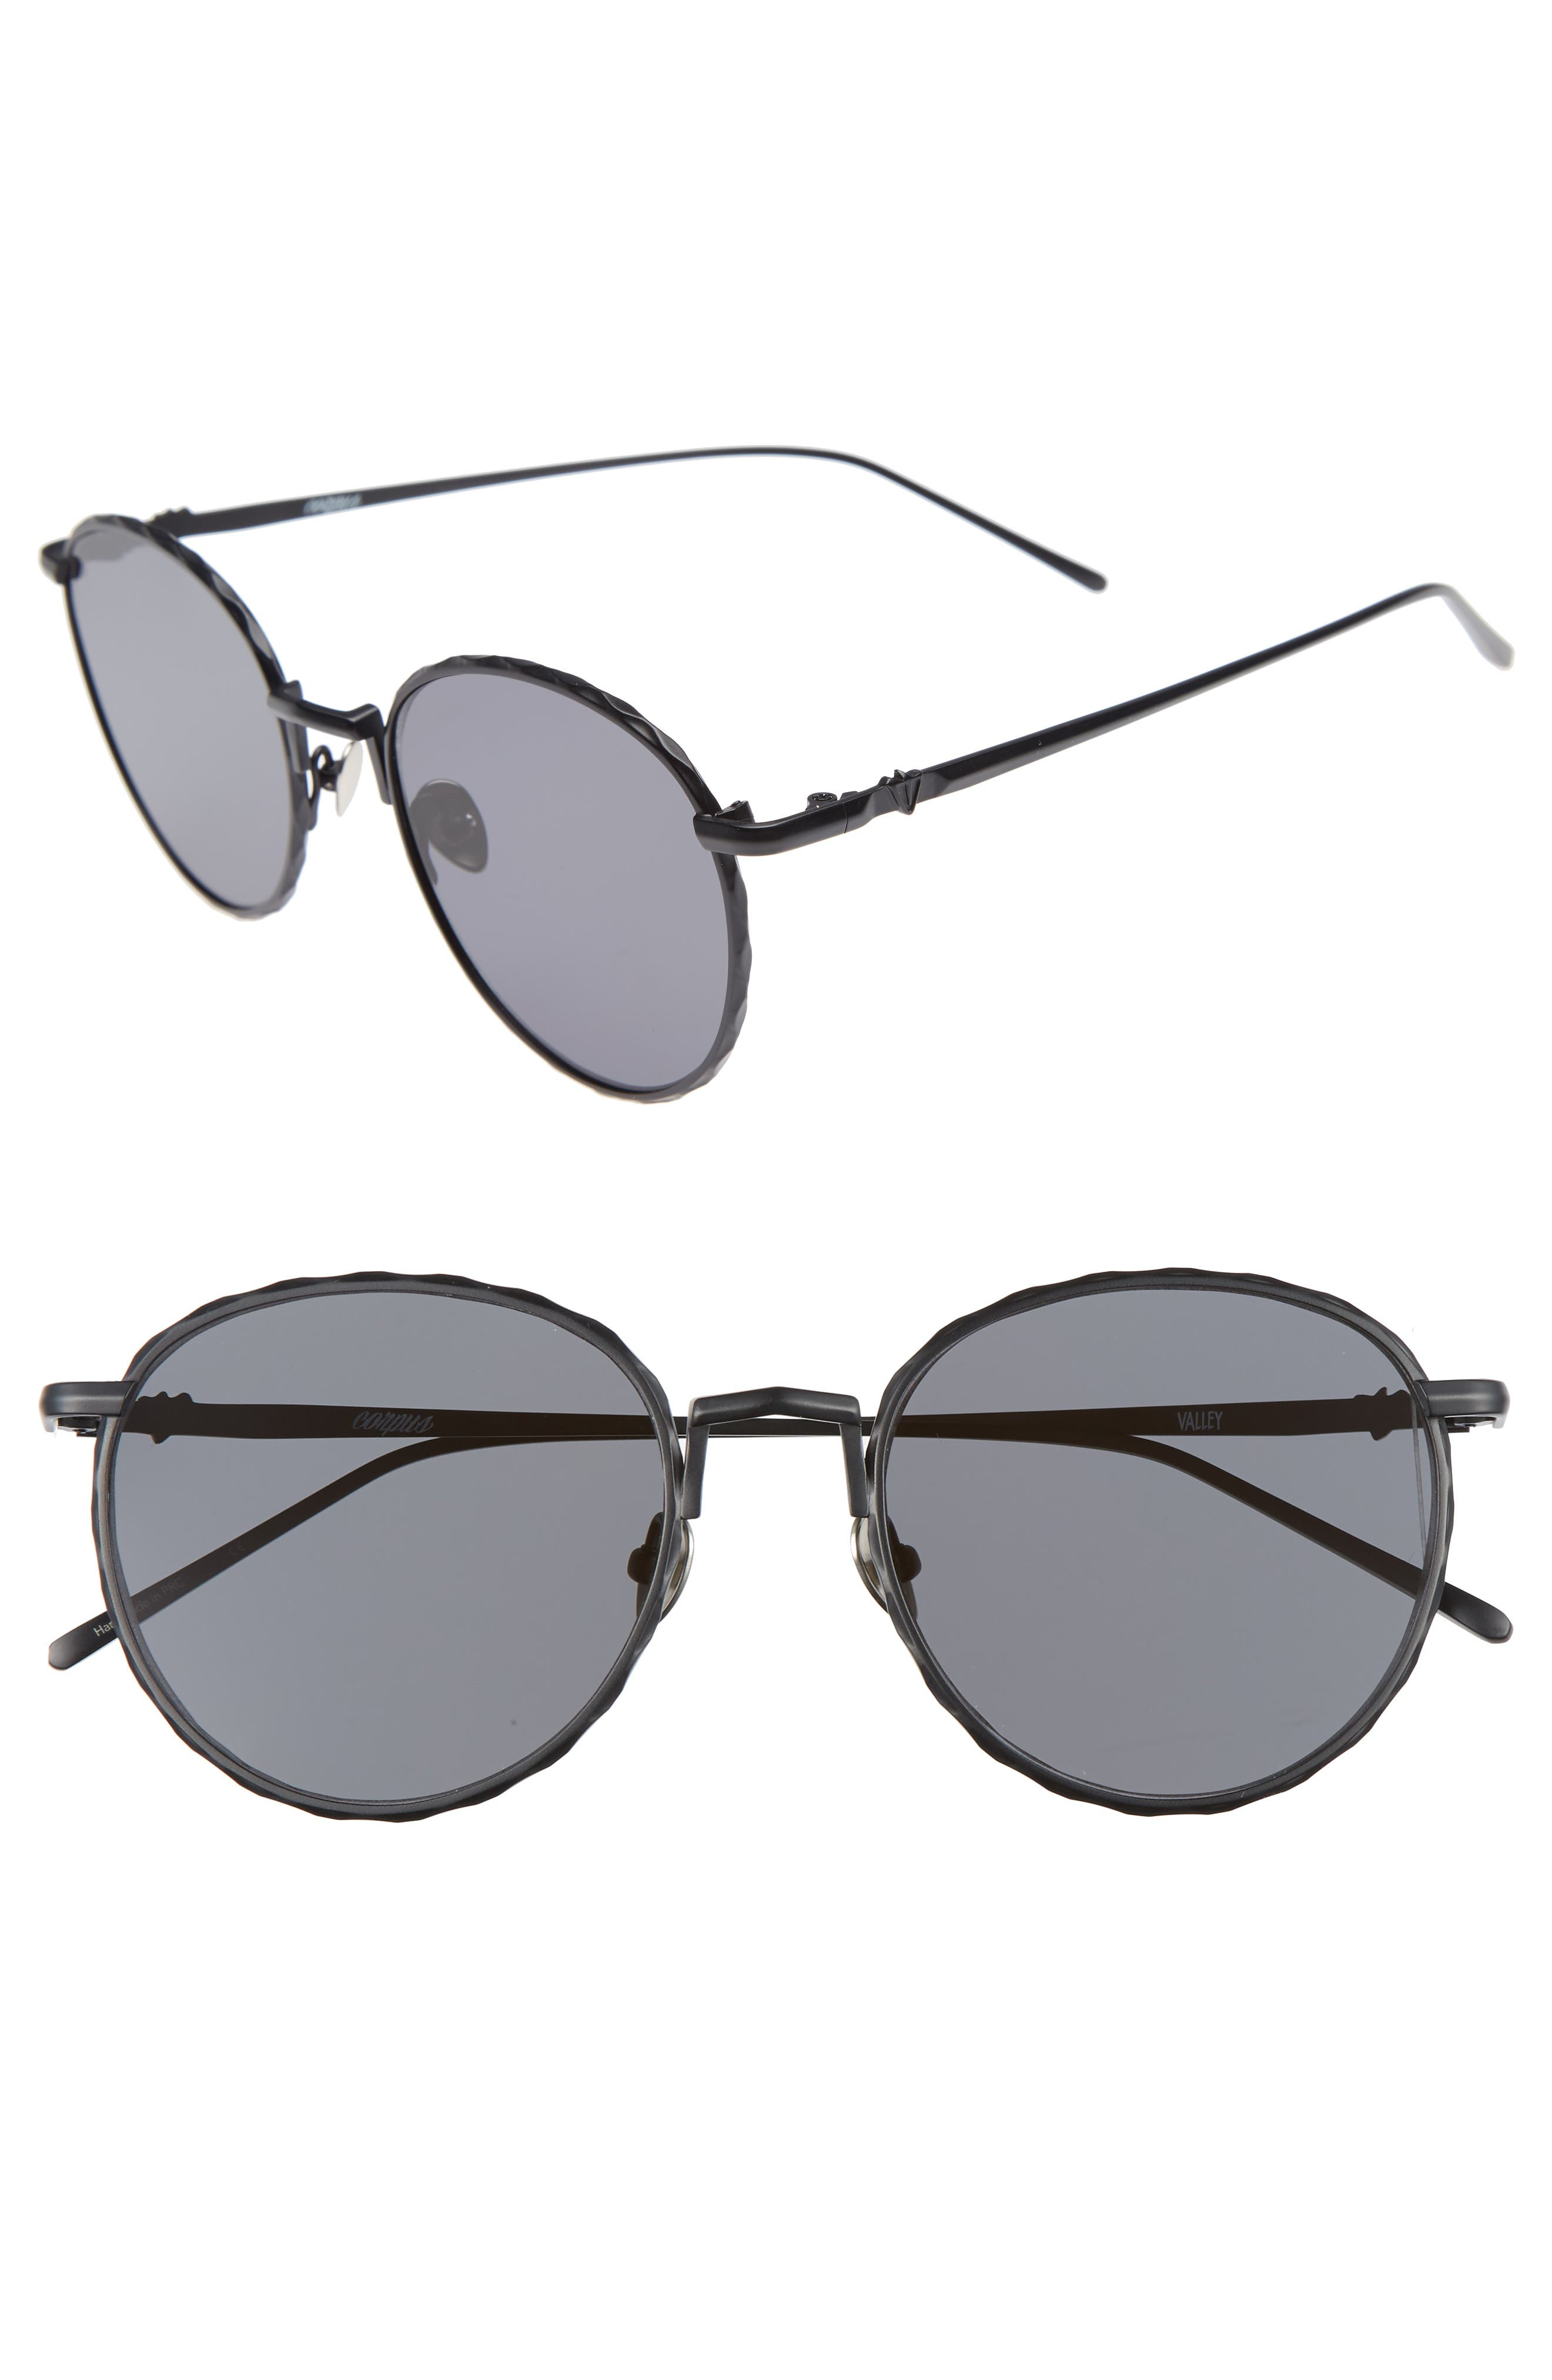 Corpus 53mm Round Sunglasses,                         Main,                         color, 001